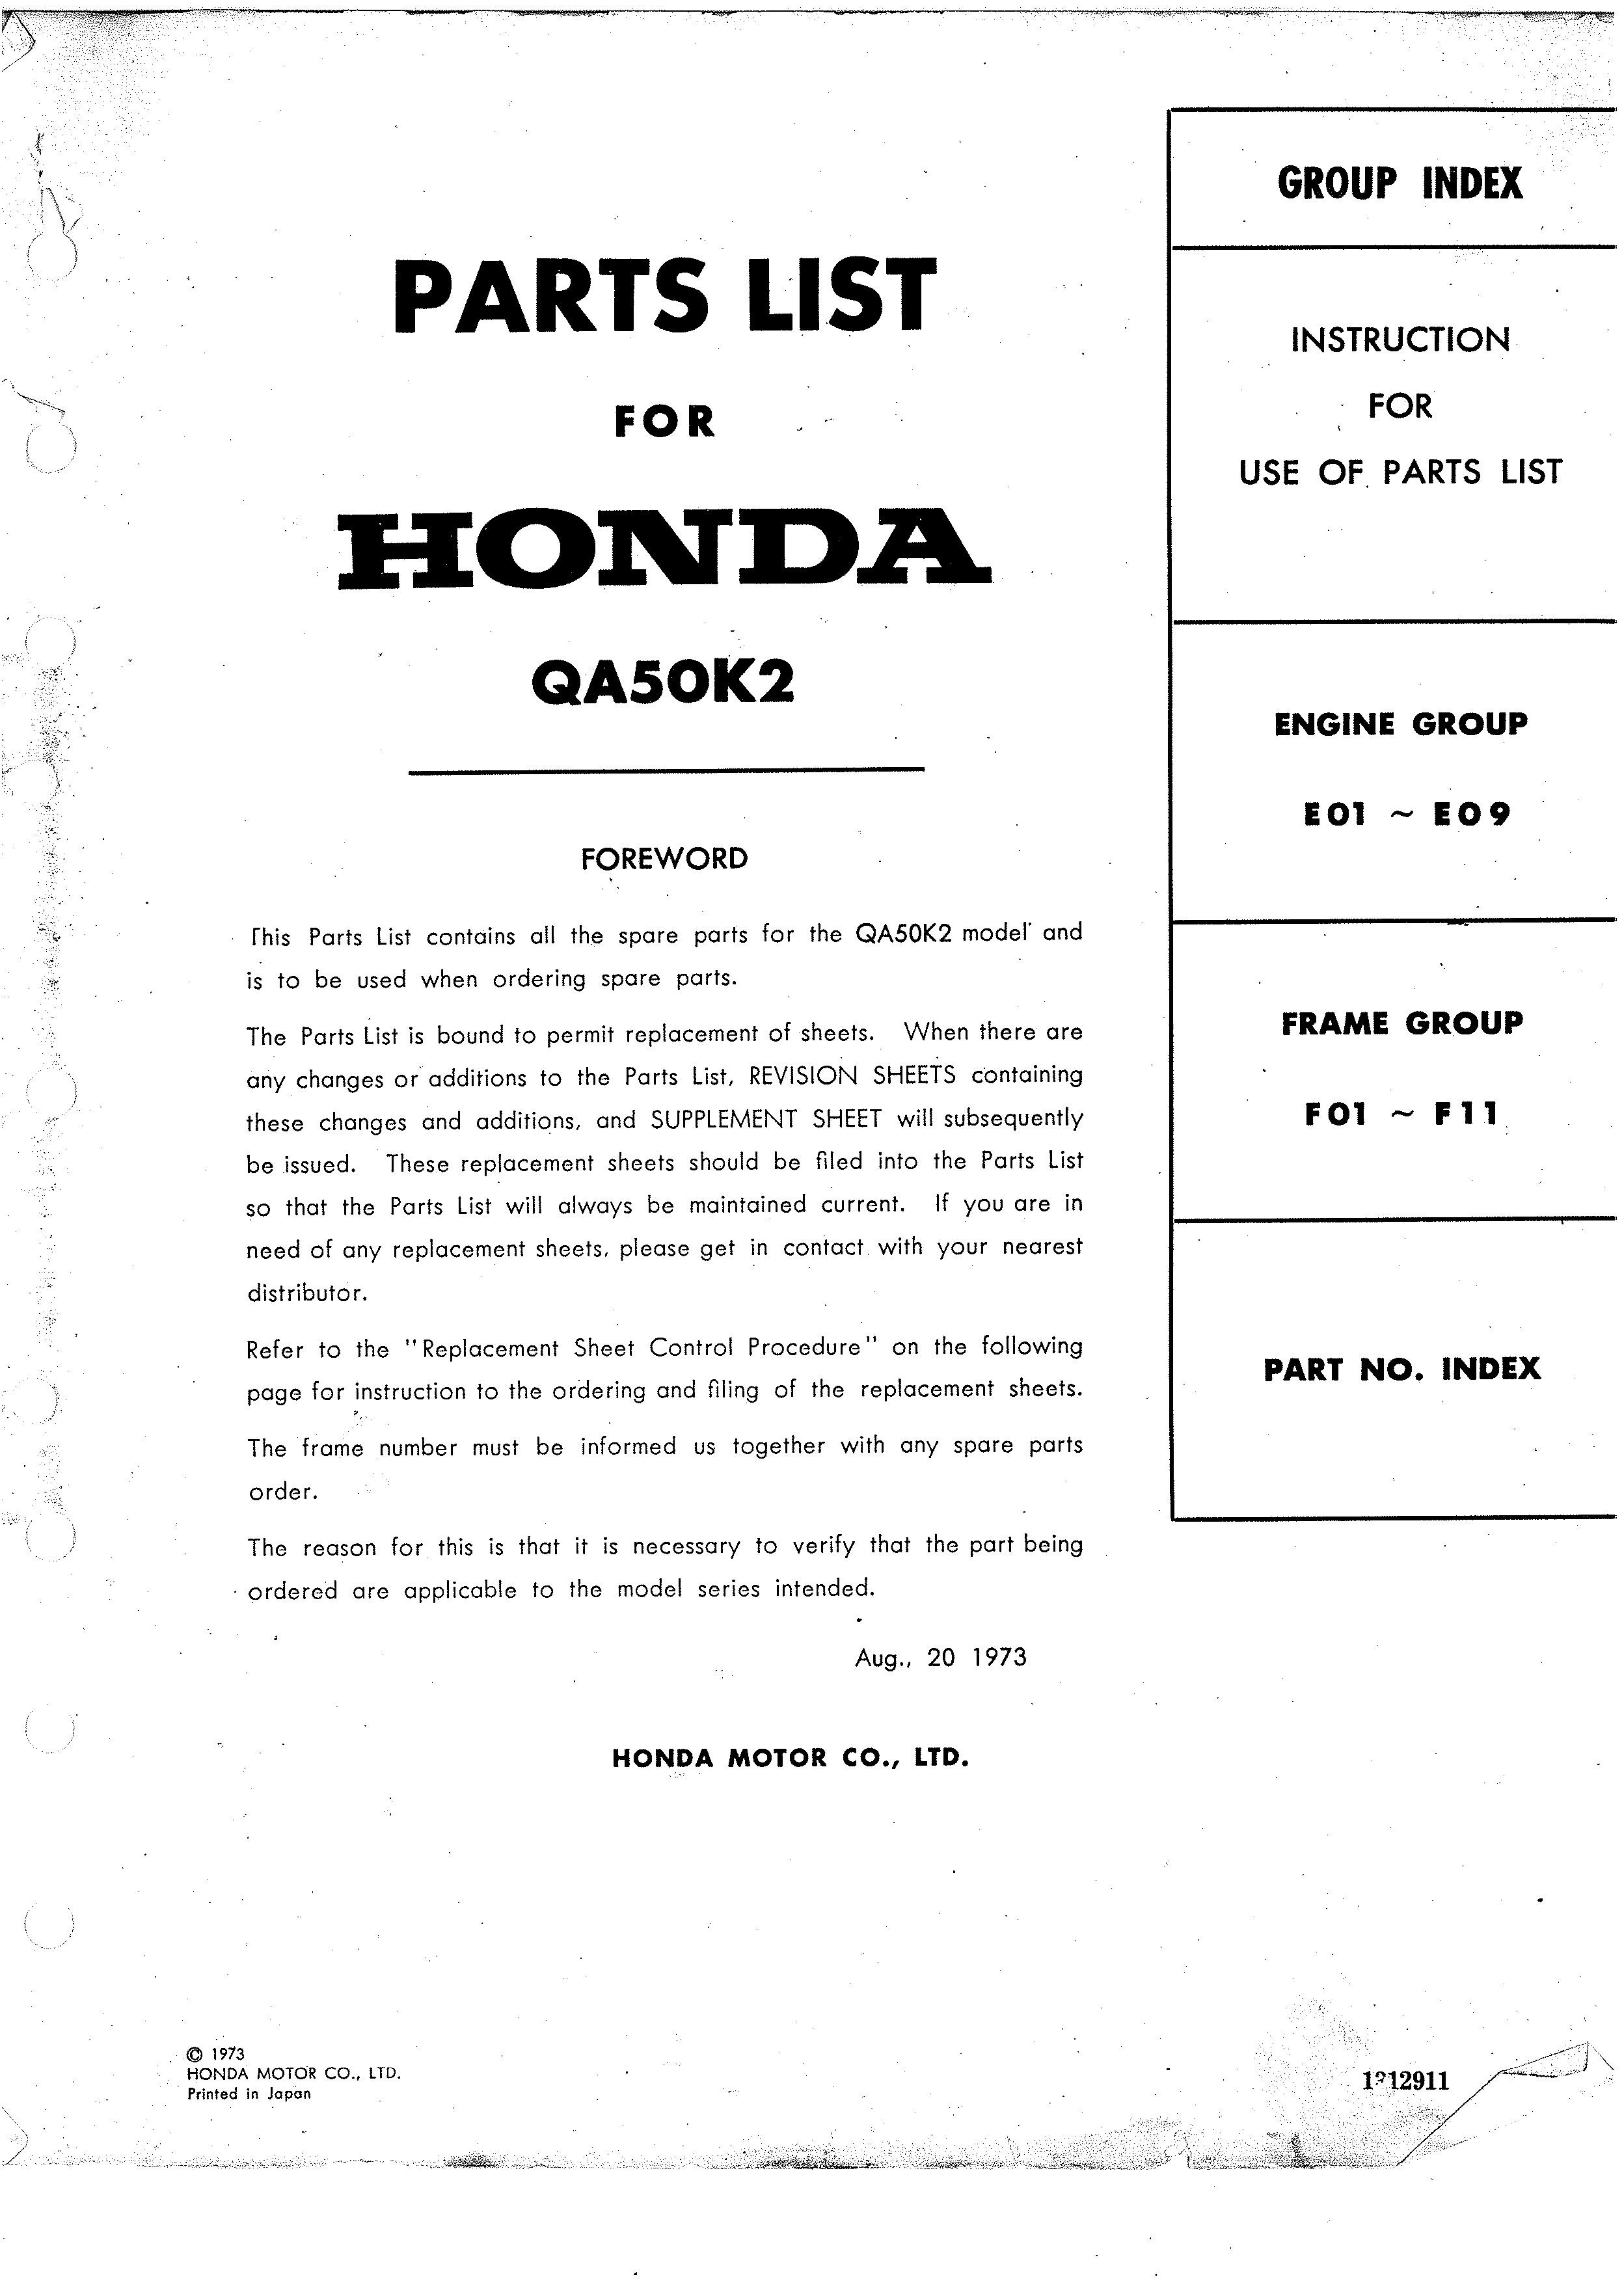 Parts List for Honda QA50K2 (1973)